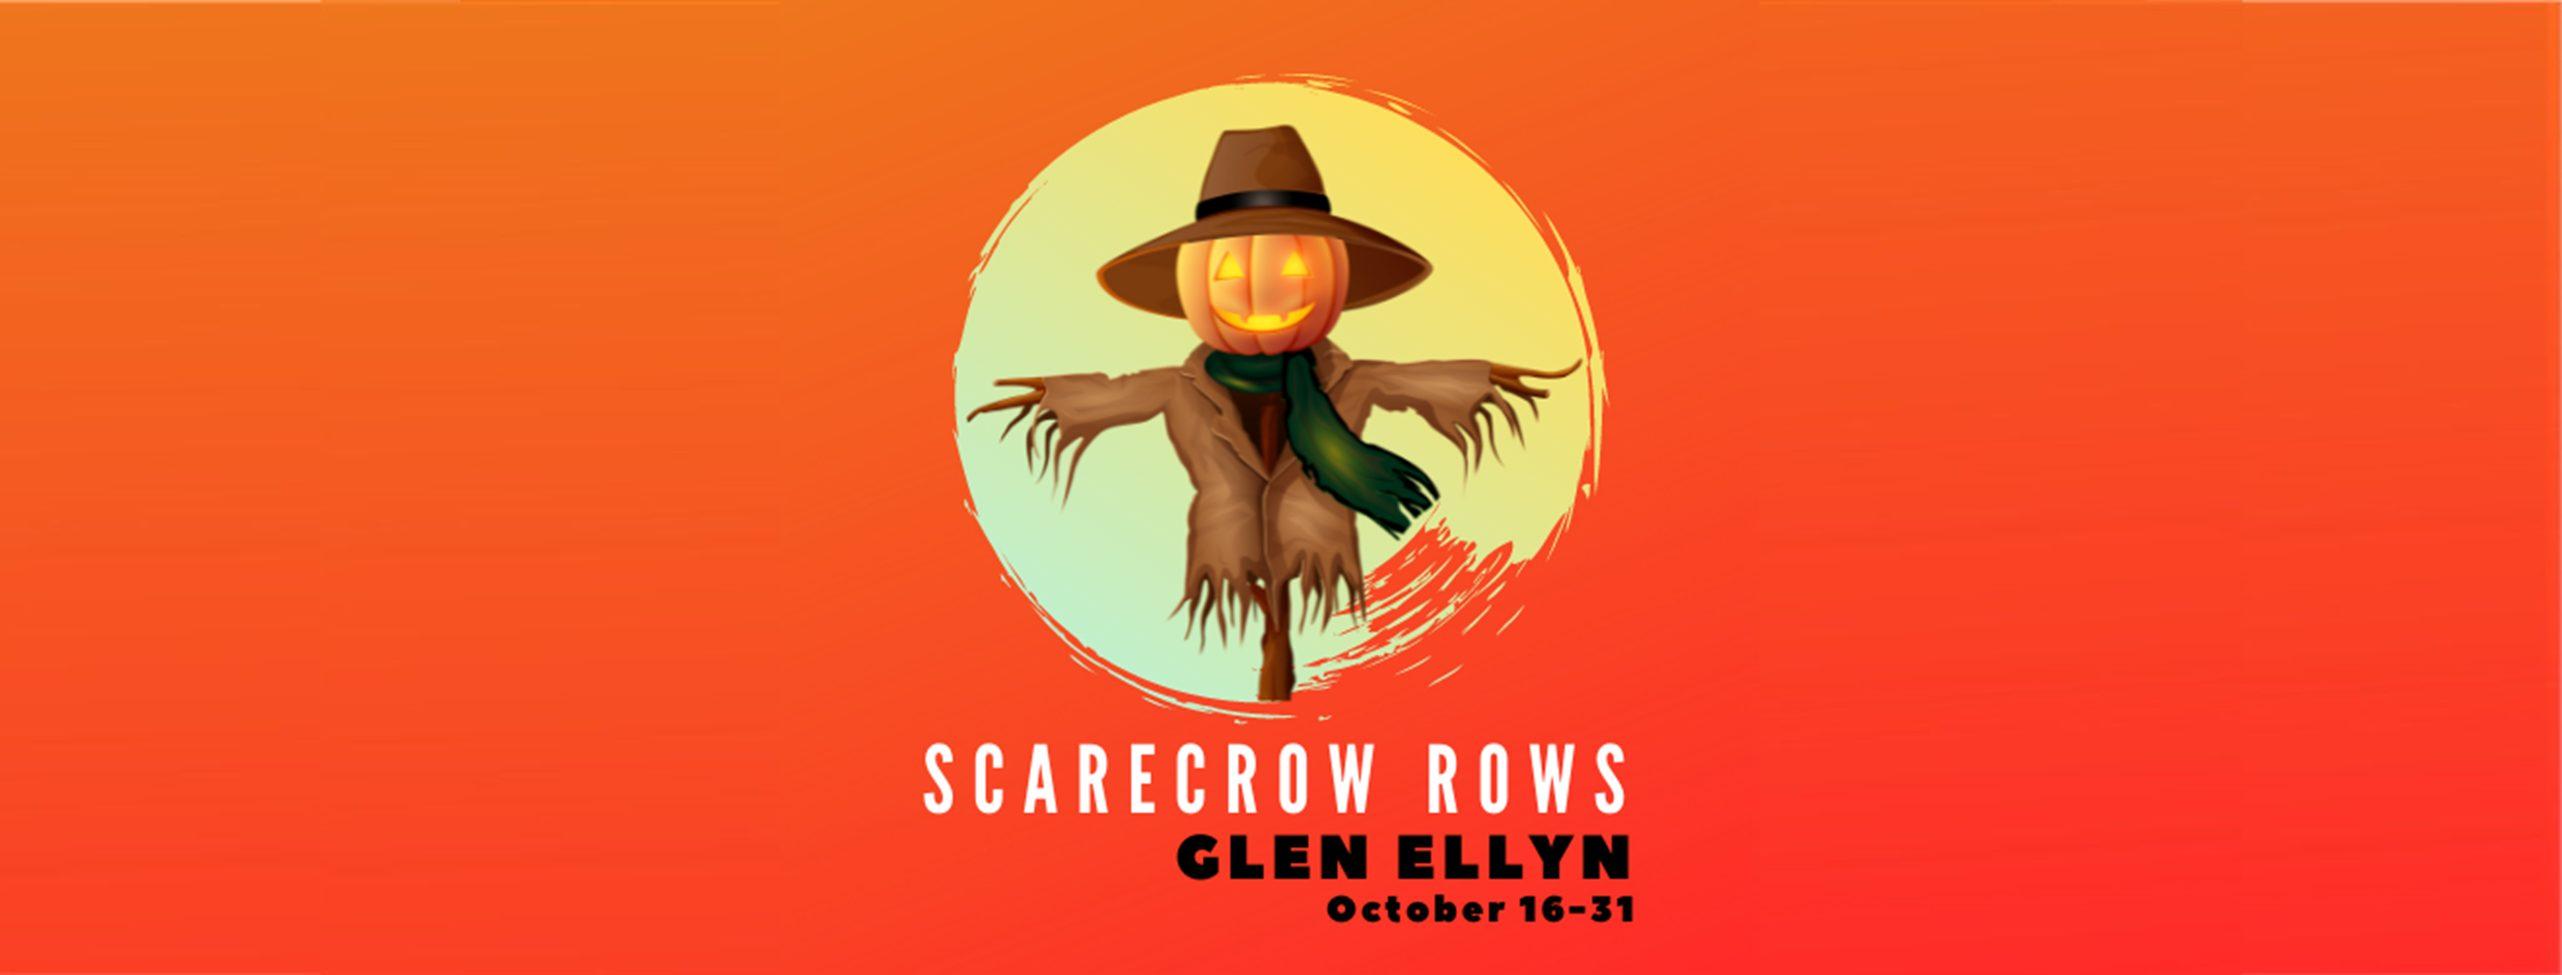 Scarecrow Rows Glen Ellyn 2021